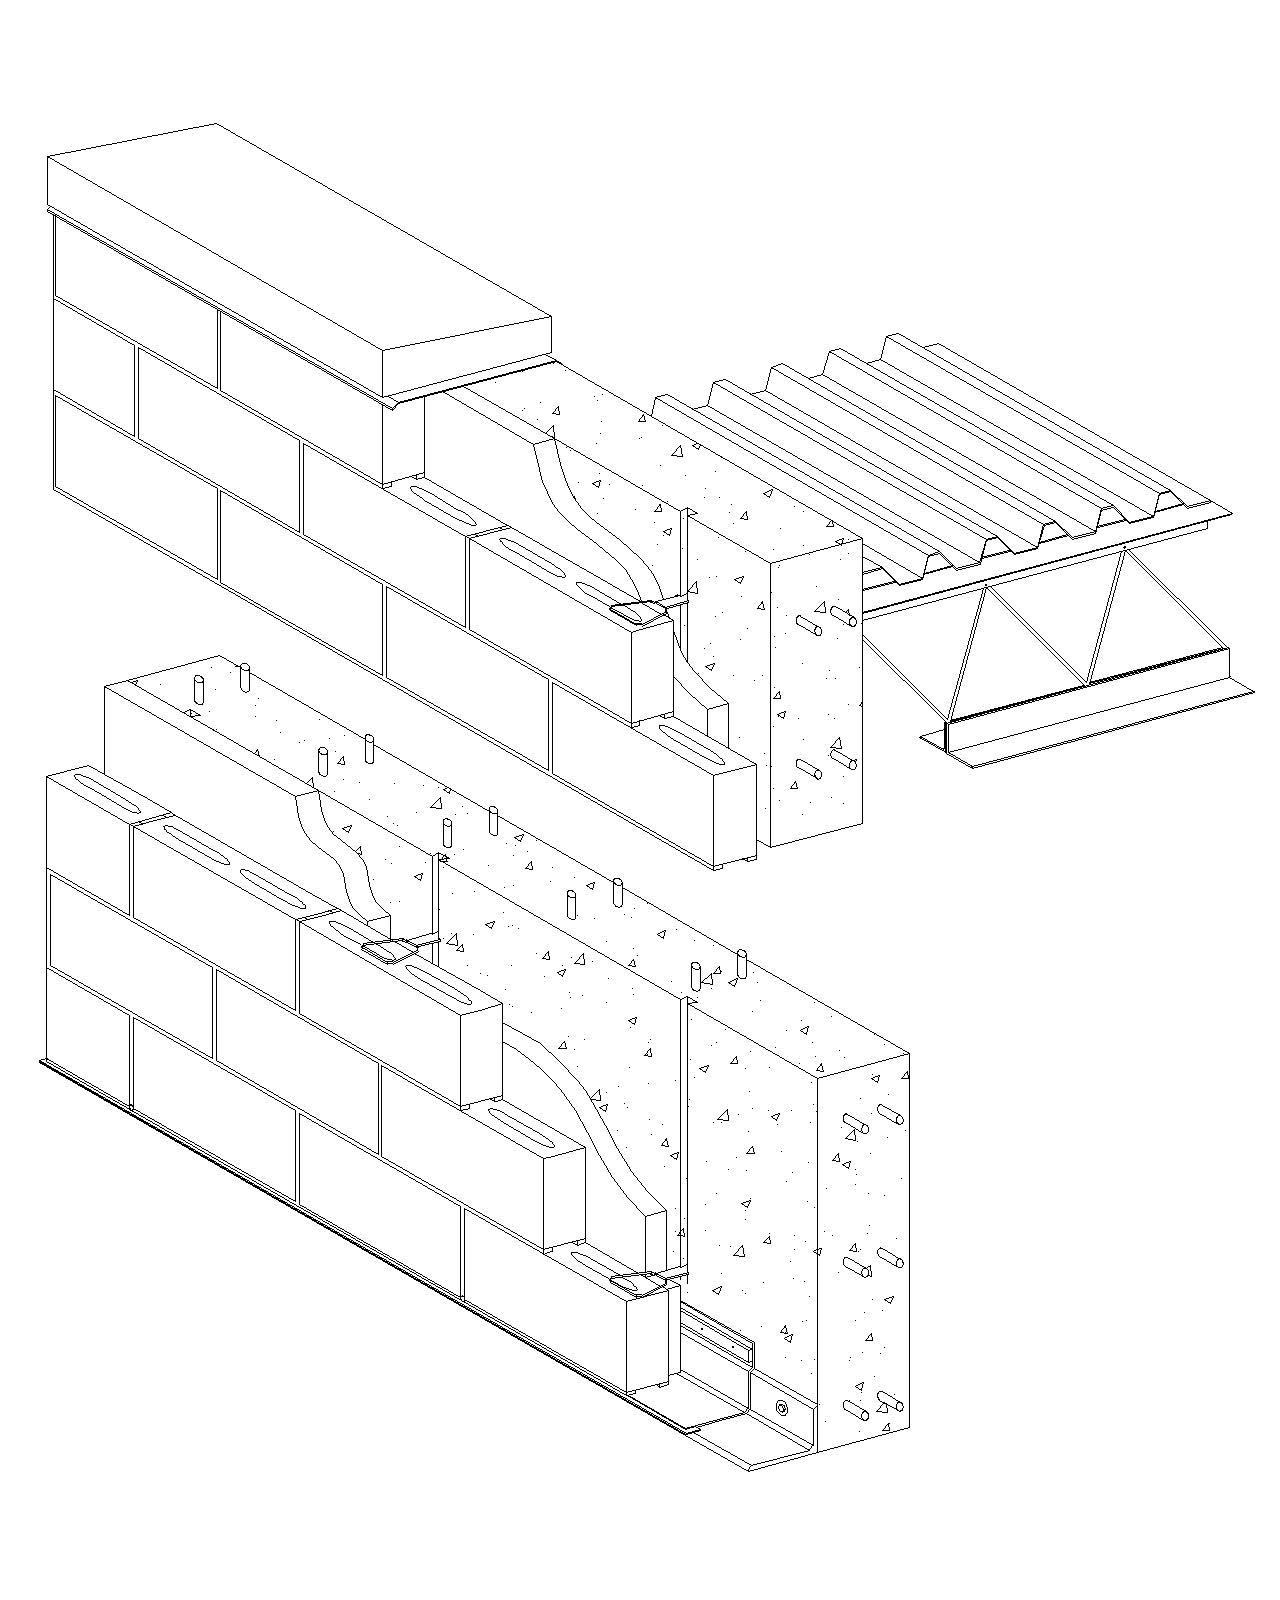 1280x1600 Cavity Wall Concrete Block Veneerreinforced Cast In Place Concrete